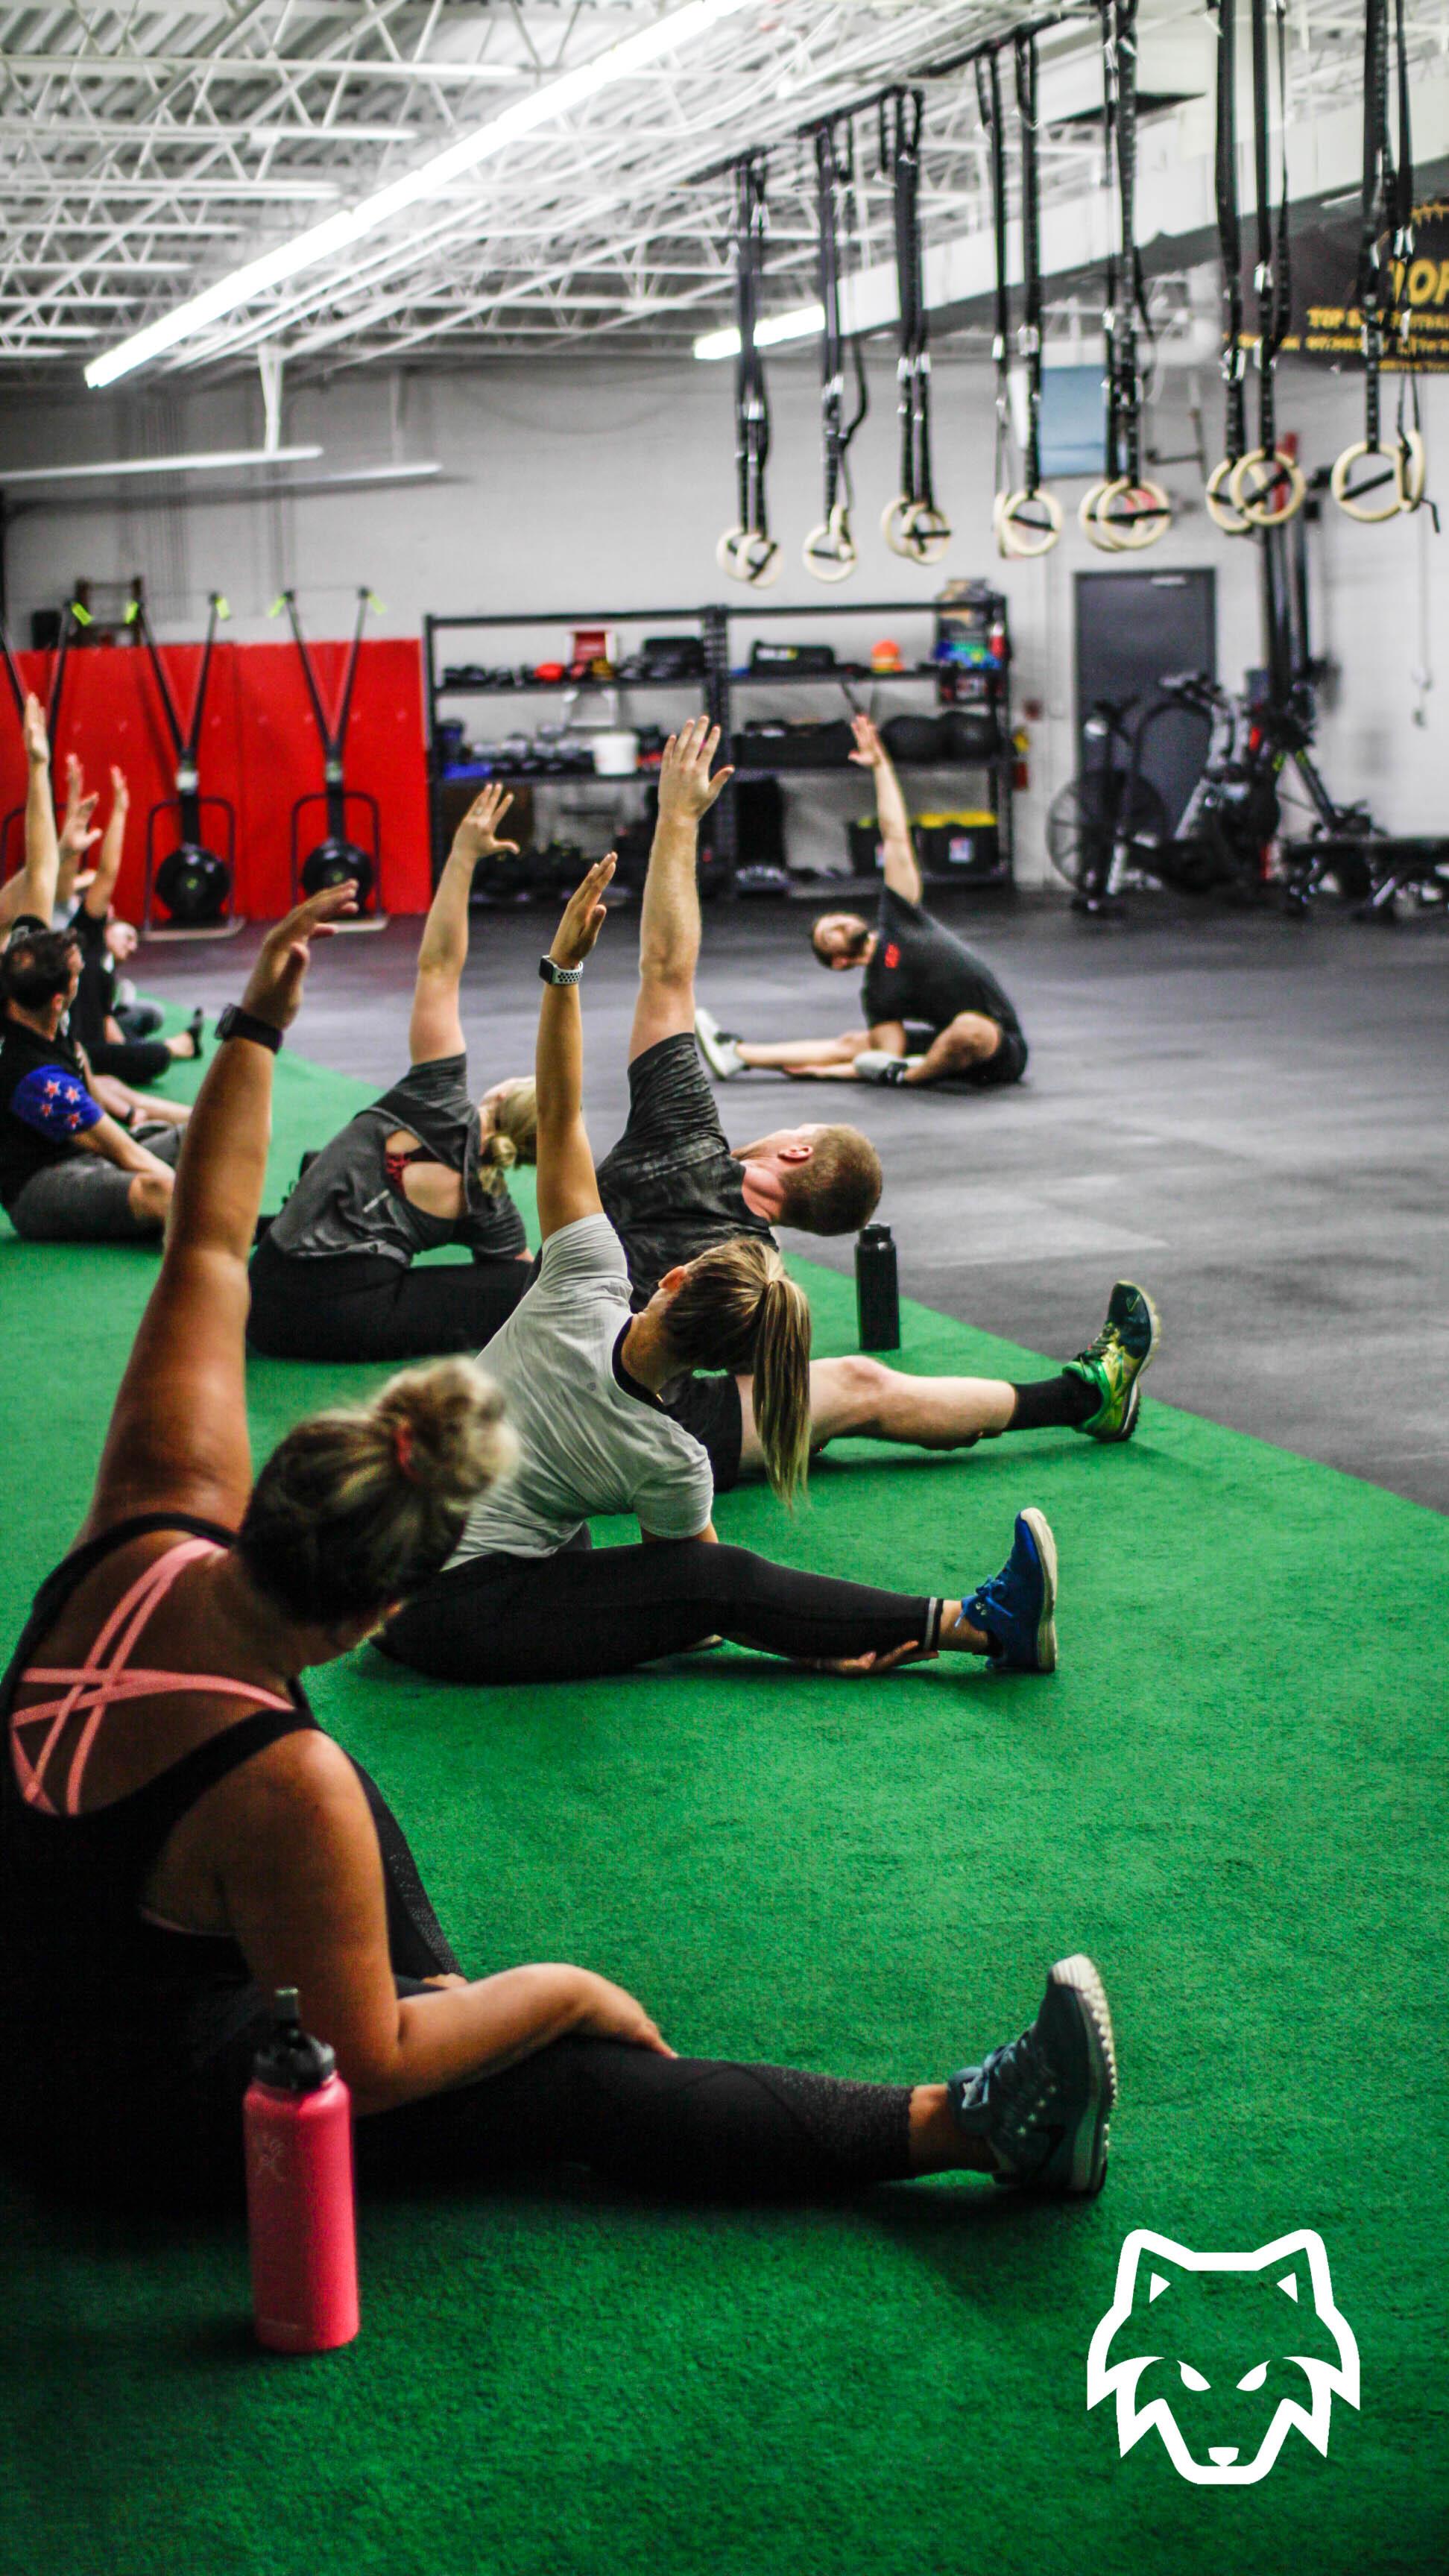 Bodyweight workout class near West Chicago, Illinois